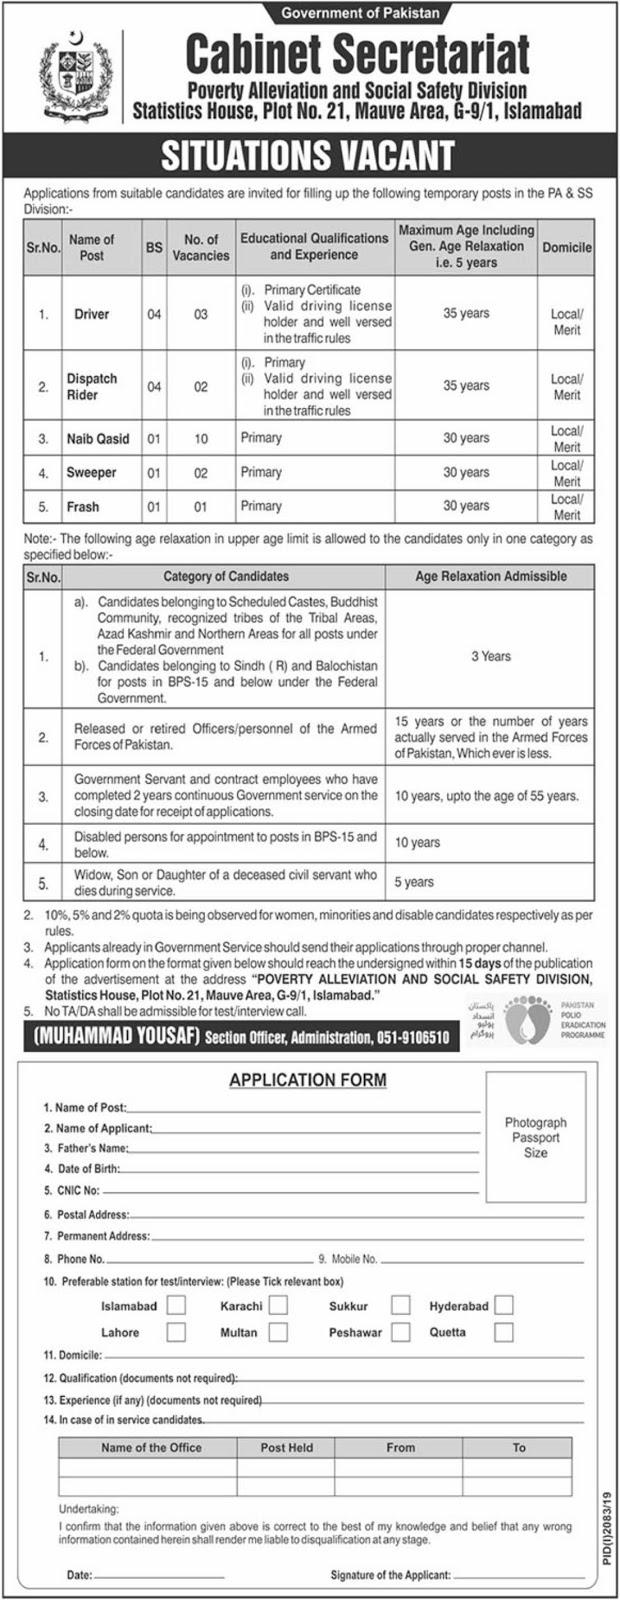 Cabinet Secretariat Jobs 2019